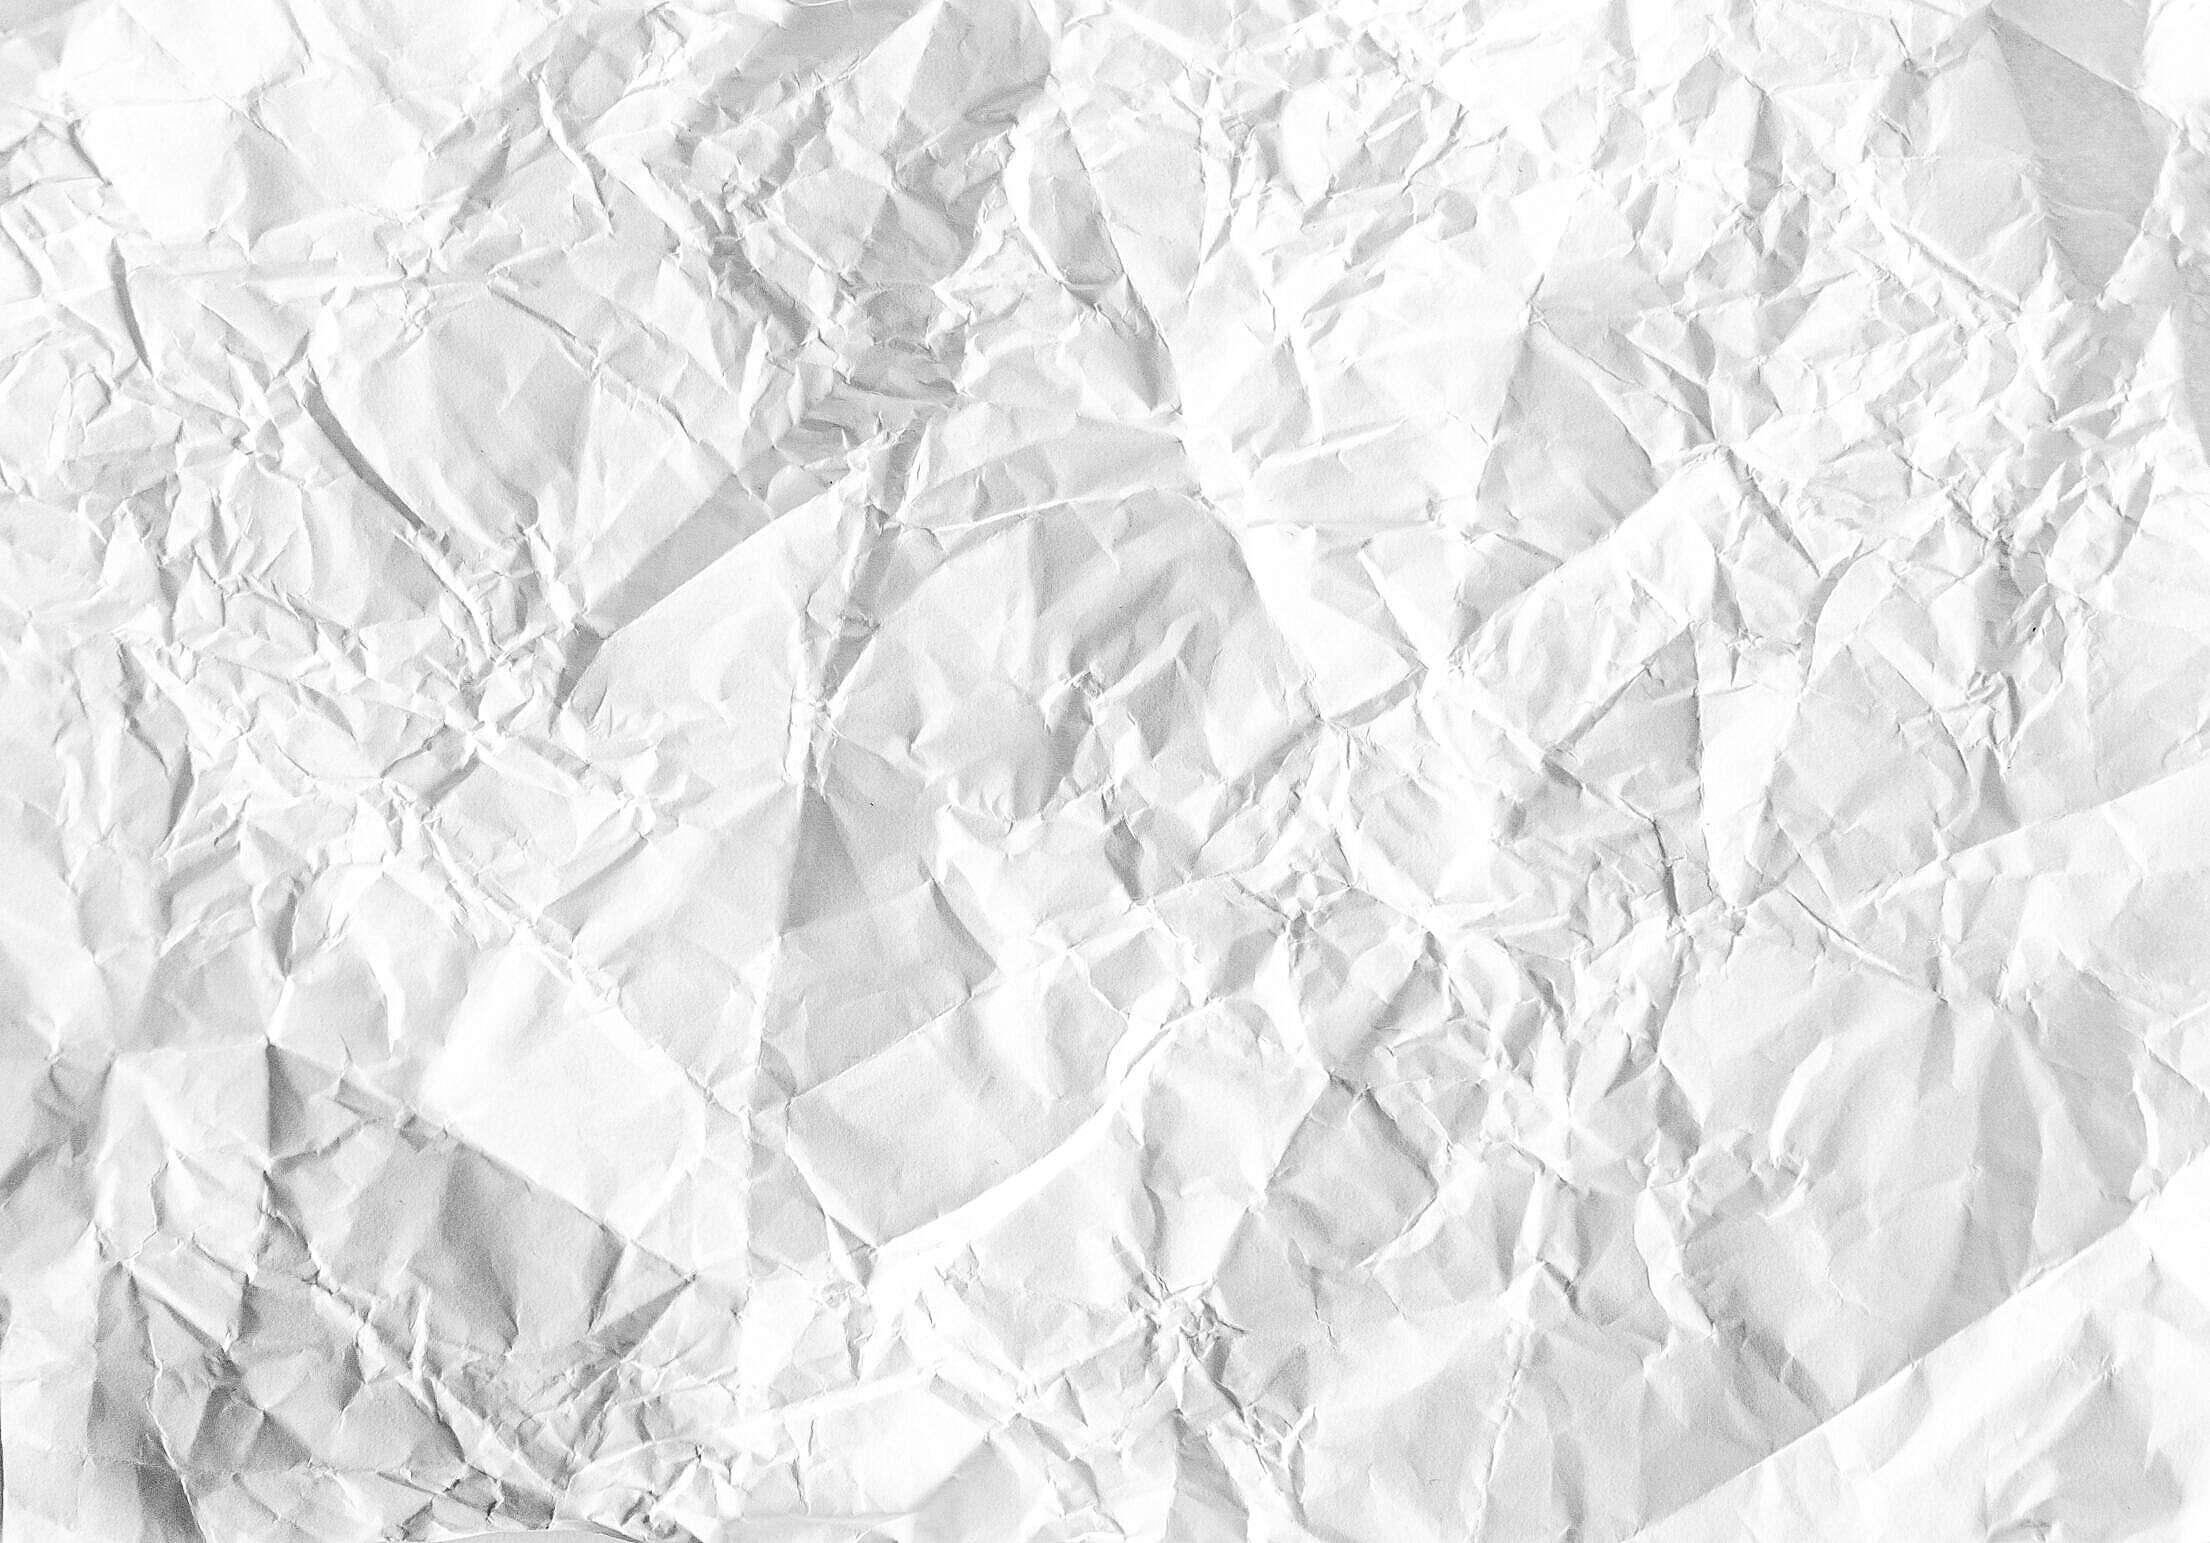 White Crumpled Paper Free Stock Photo